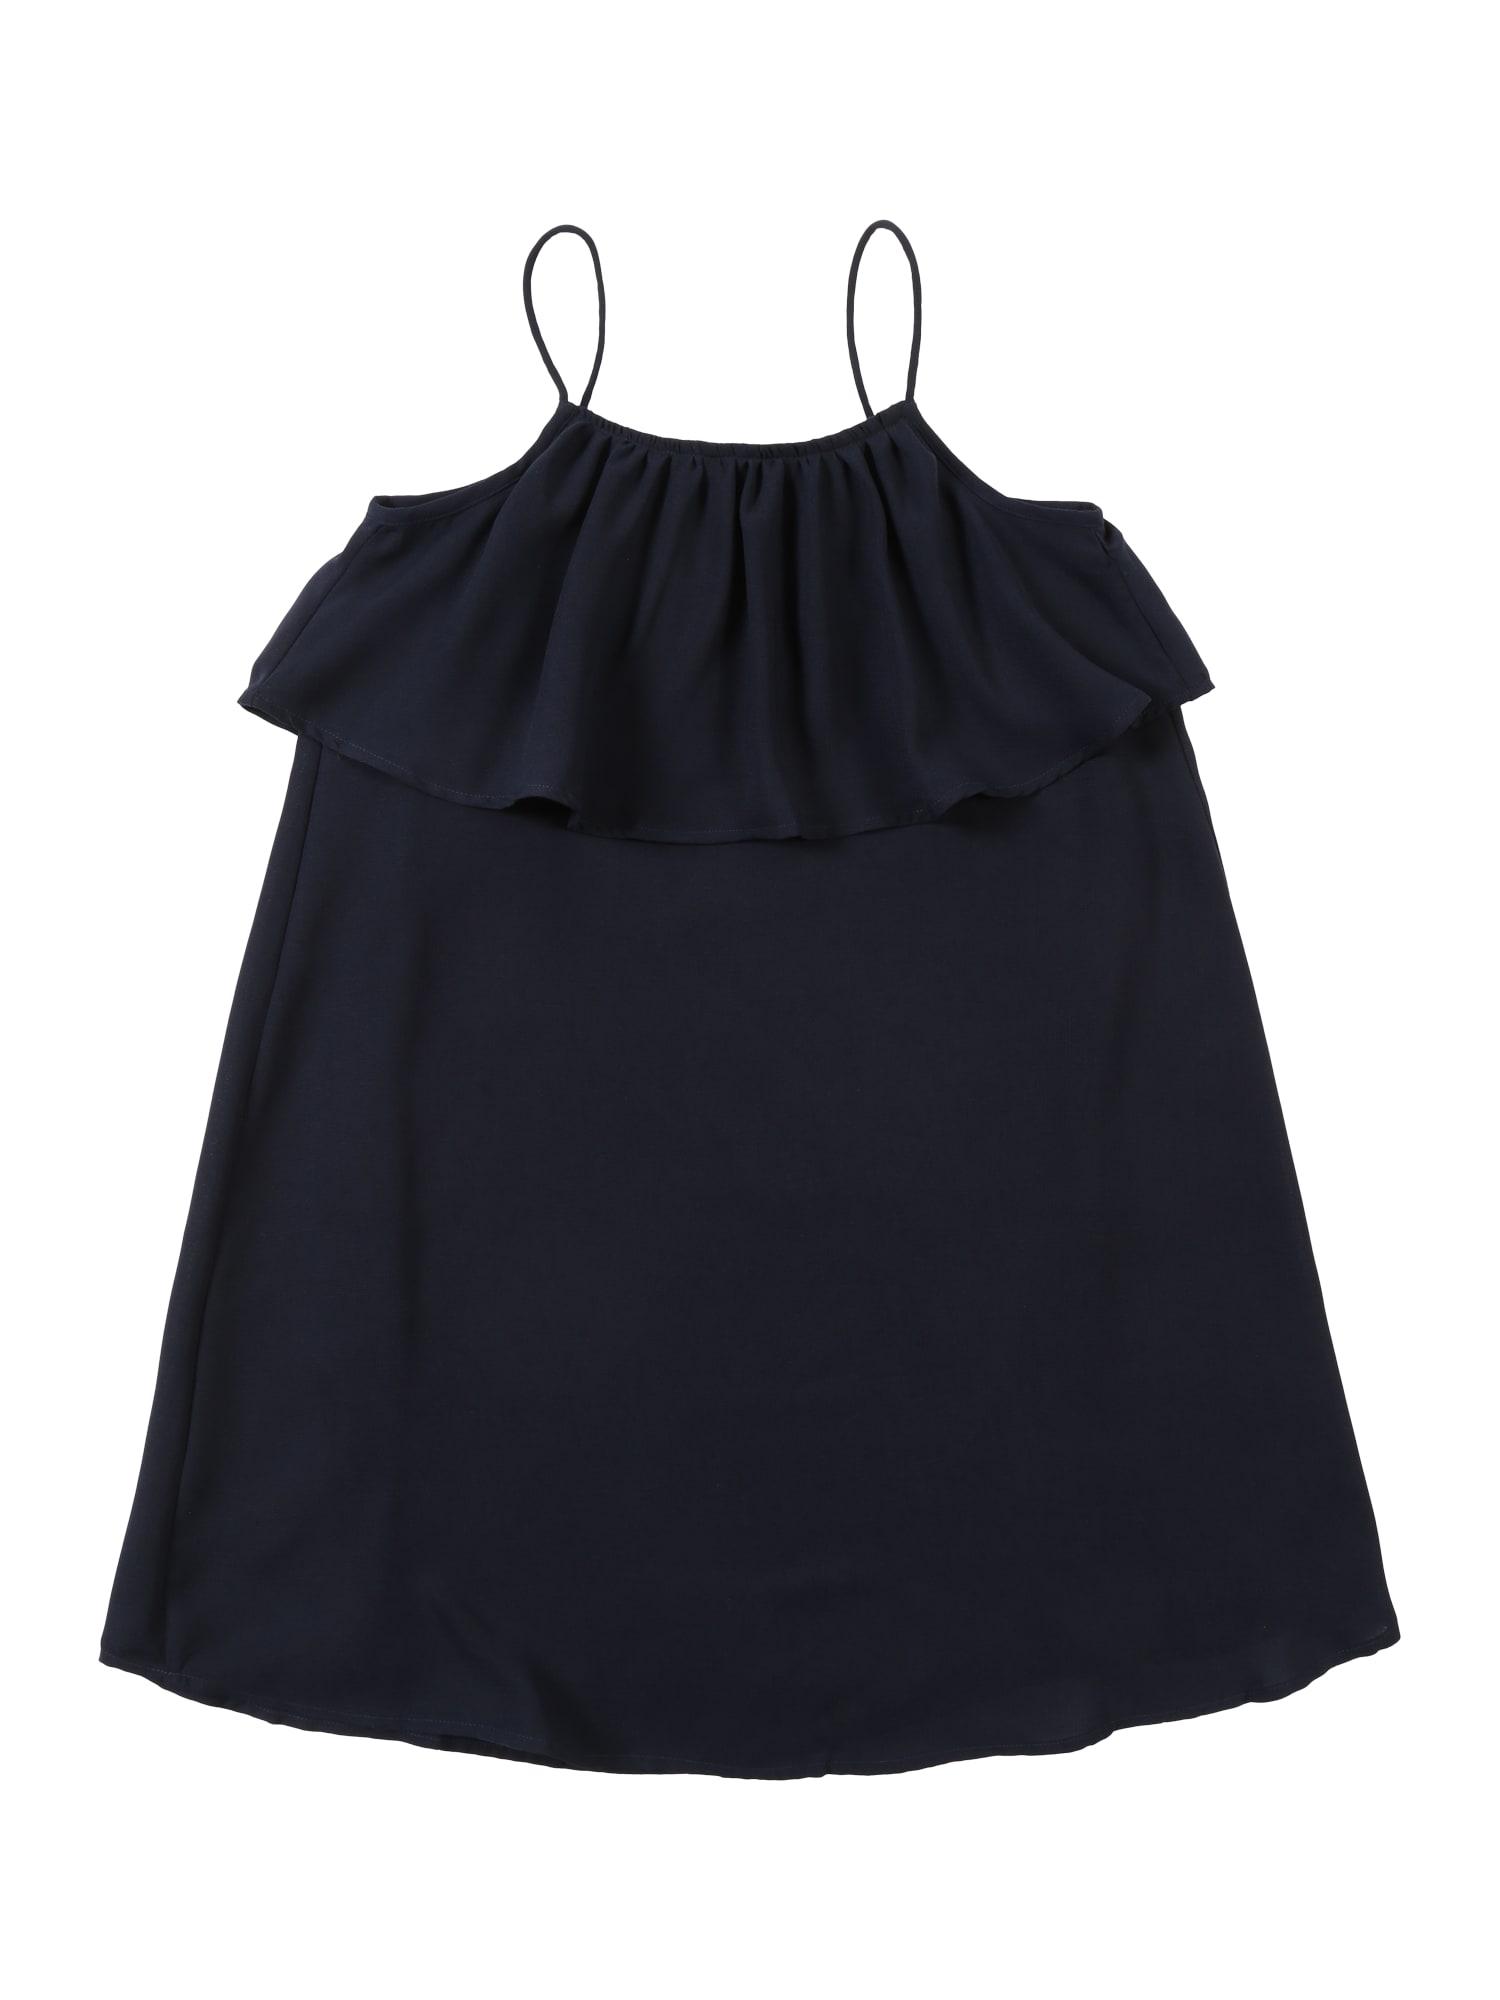 Šaty TG-19-KL203 námořnická modř REVIEW FOR TEENS